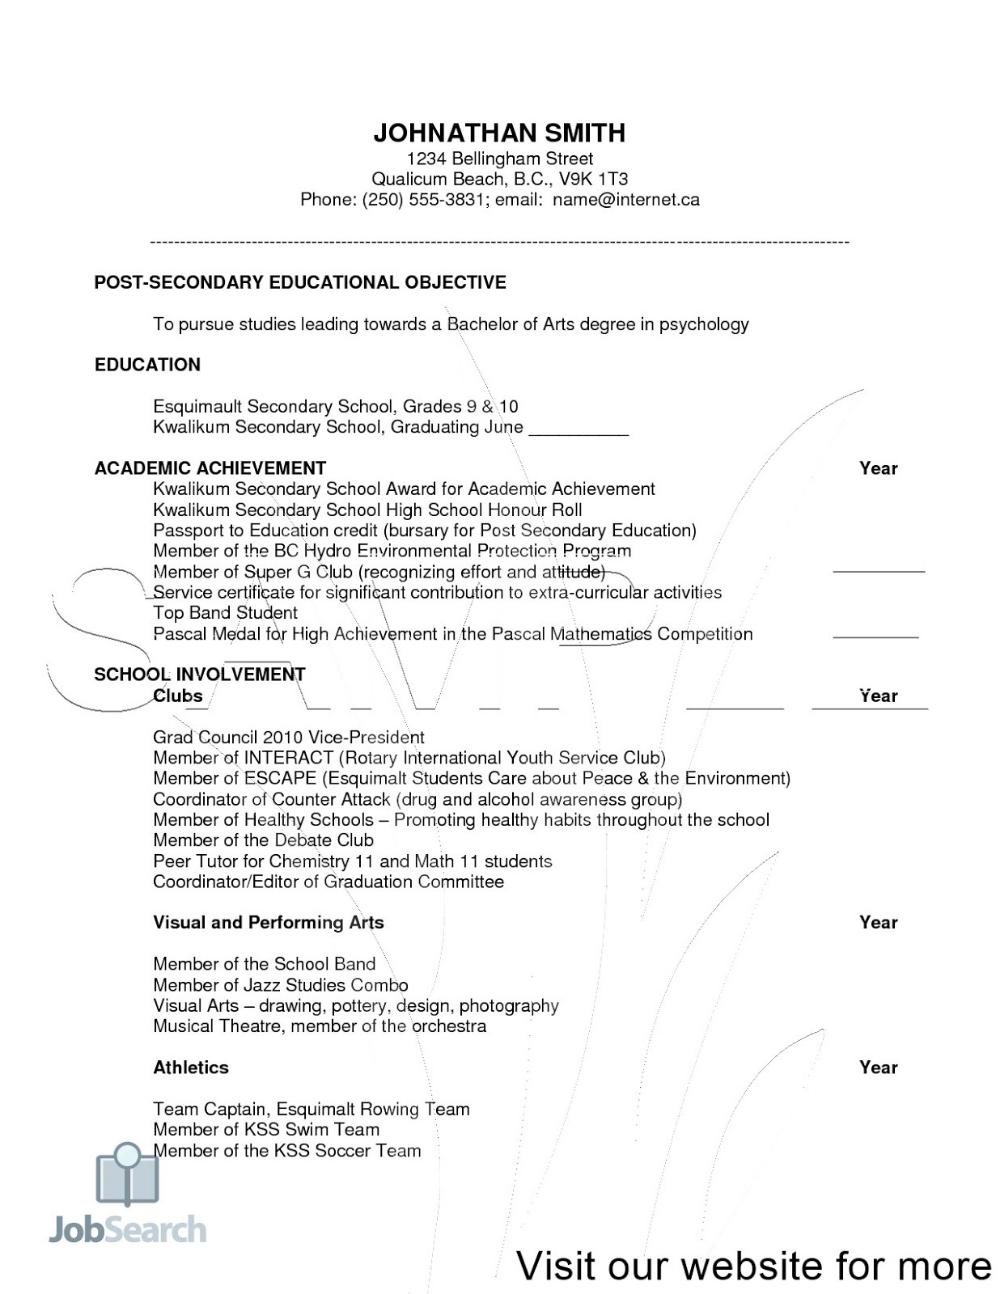 Resume Template For Scholarship - Resume Samples